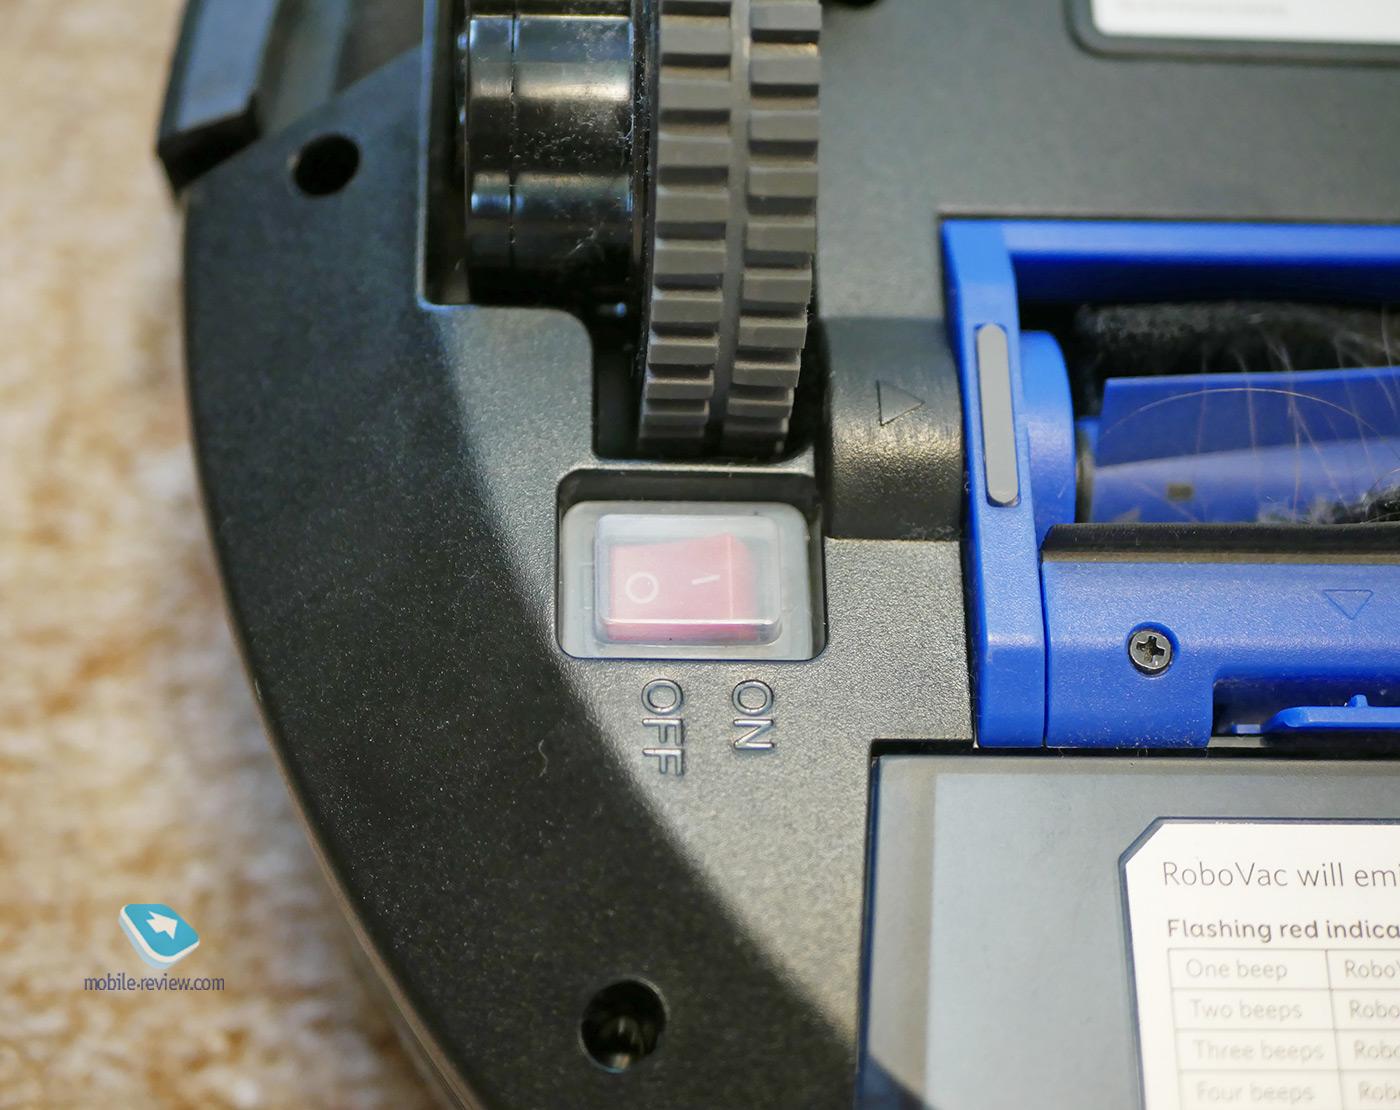 Обзор робота-пылесоса Eufy by Anker RoboVac R450